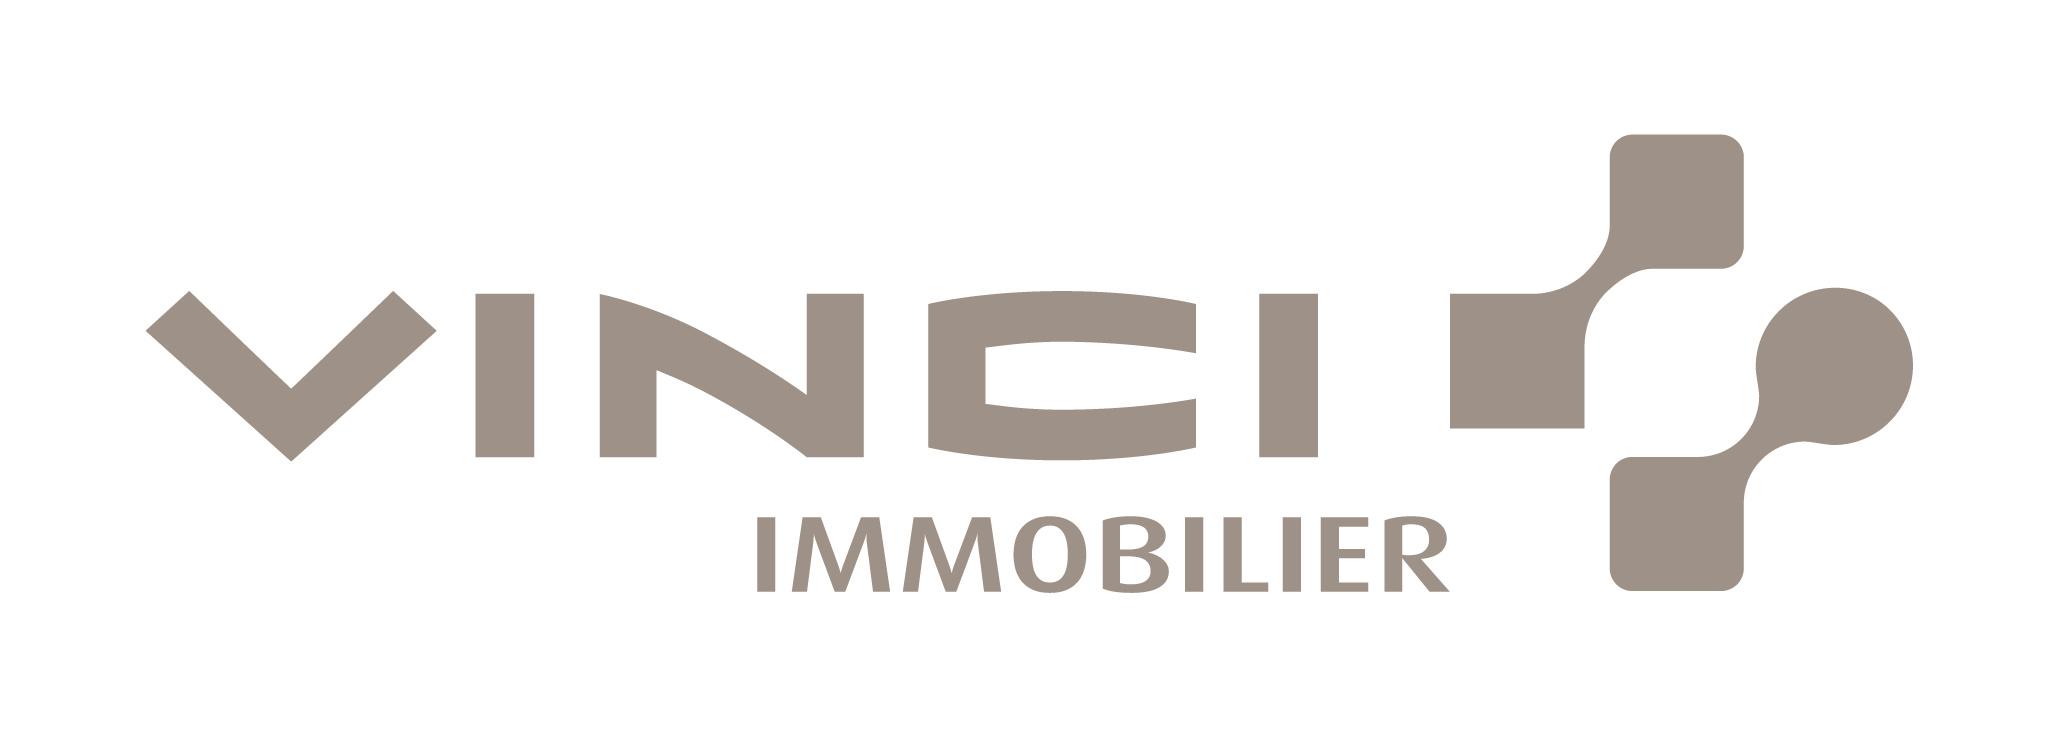 Logo VINCI Immobilier CMJN G image